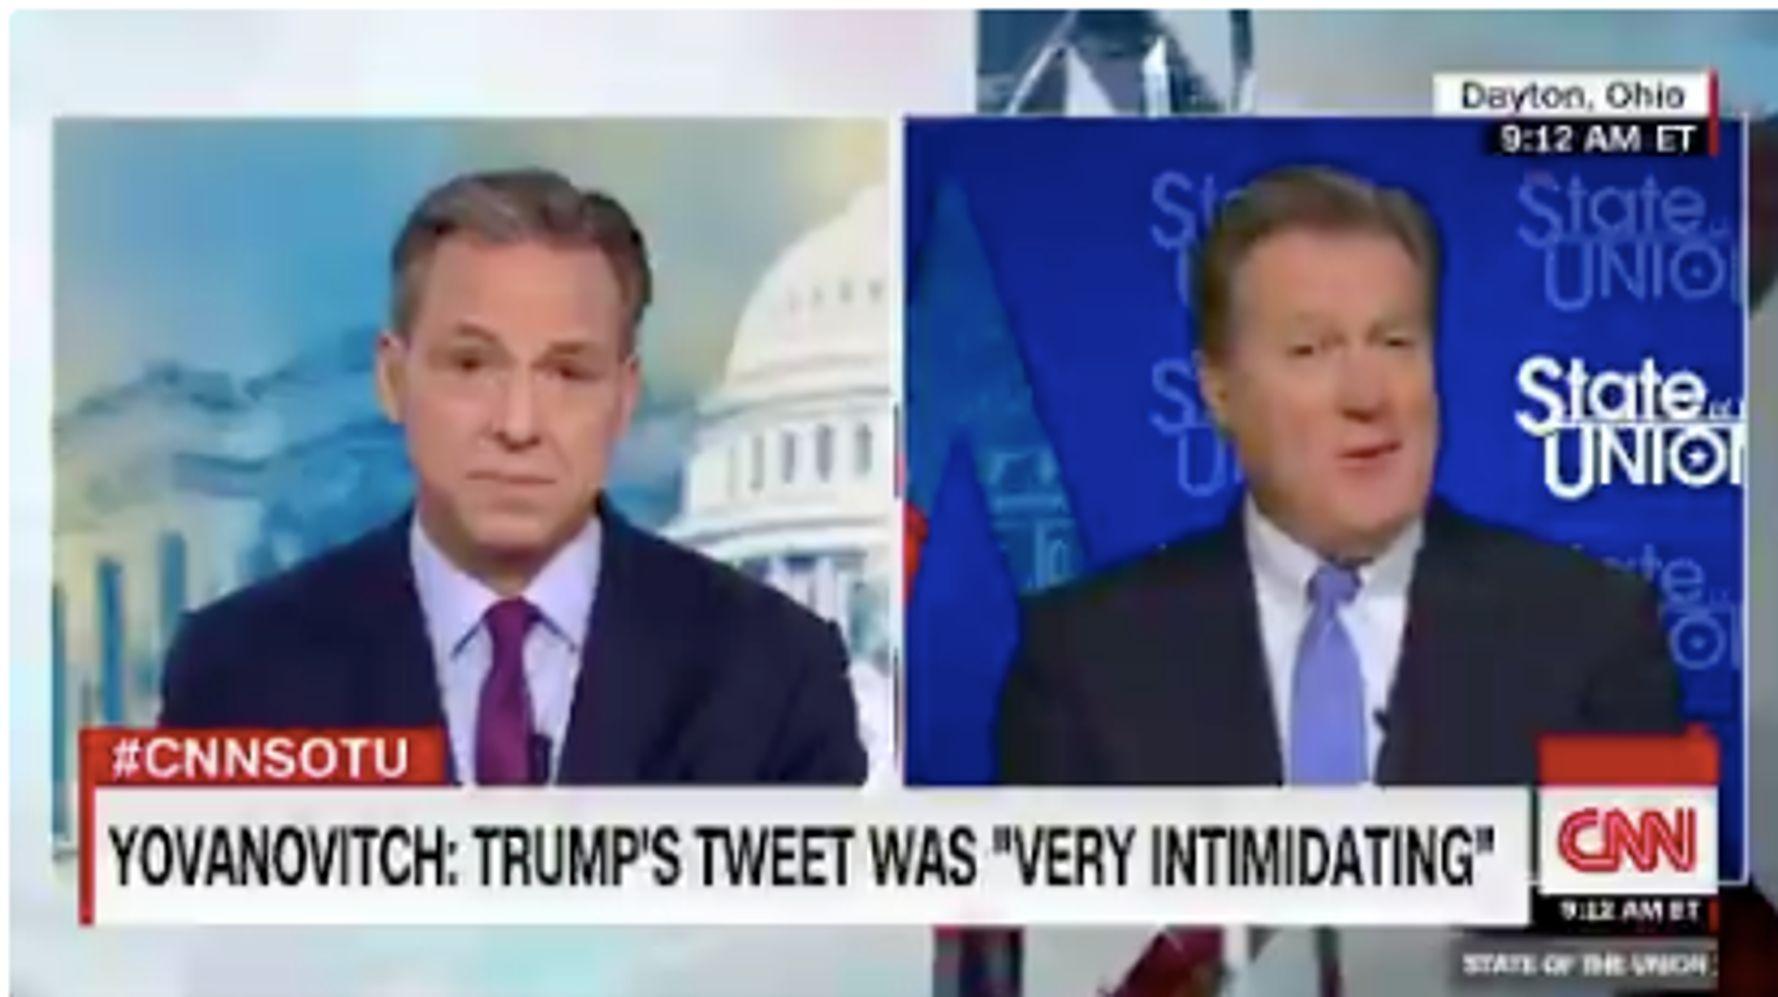 Westlake Legal Group 5dd192ff2100006a6434d32c GOP Congressman: Trump's Yovanovitch Tweet 'Unfortunate' But 'Not Impeachable'